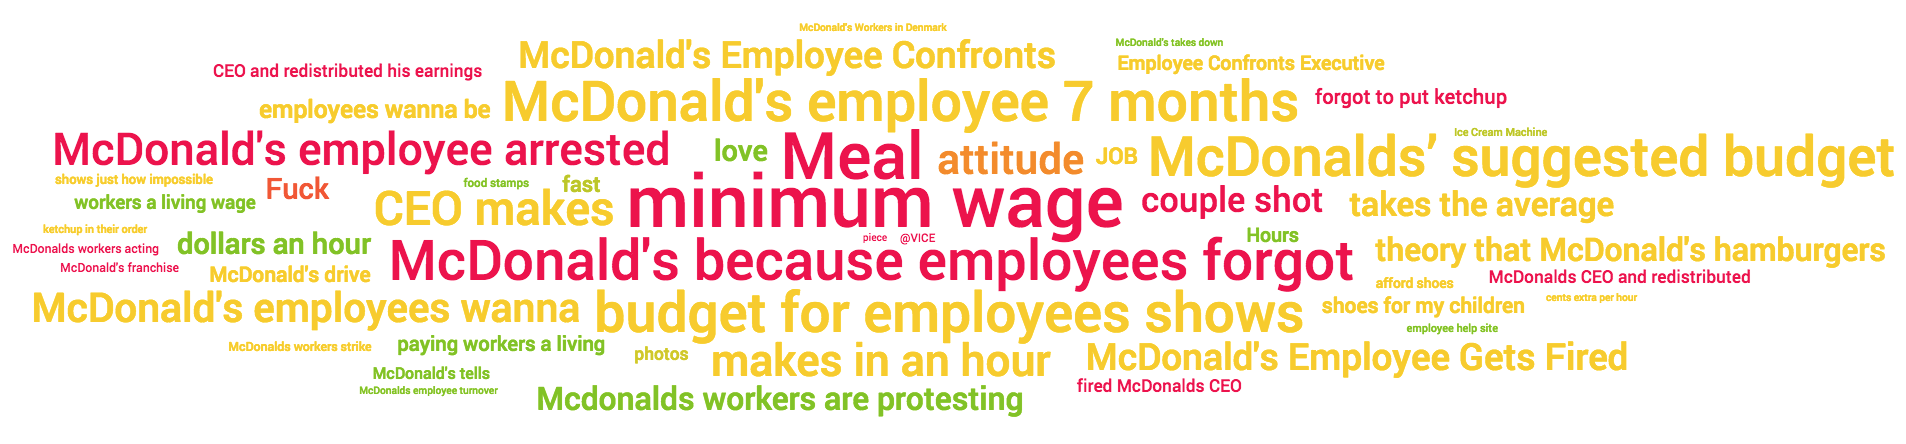 Millennials negative expression for minimum wage